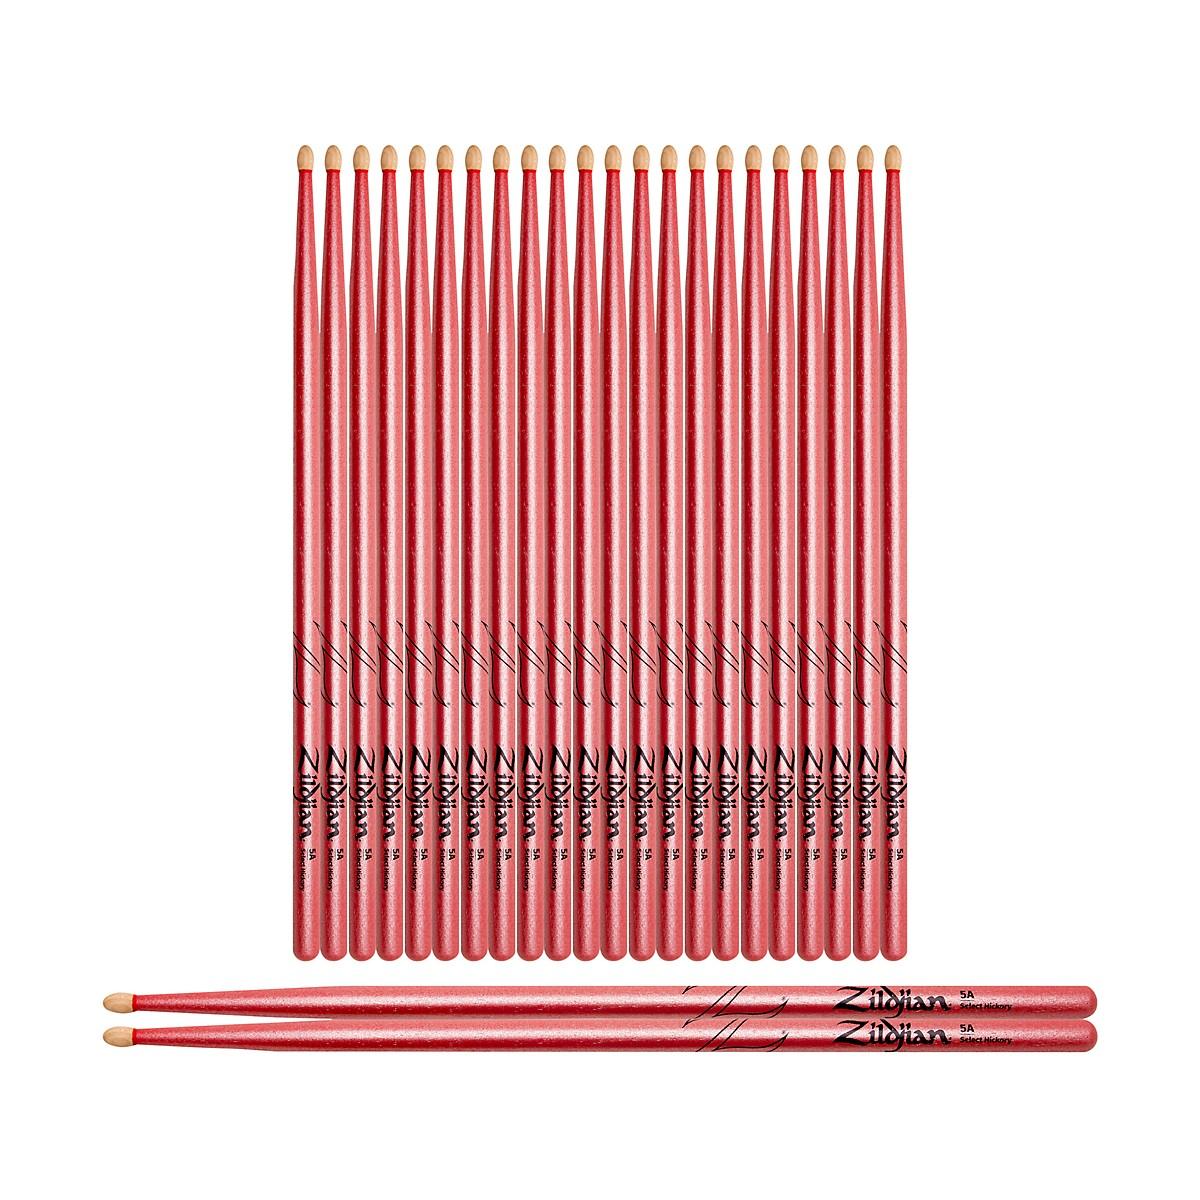 Zildjian Chroma Pink Drum Sticks 12-Pack